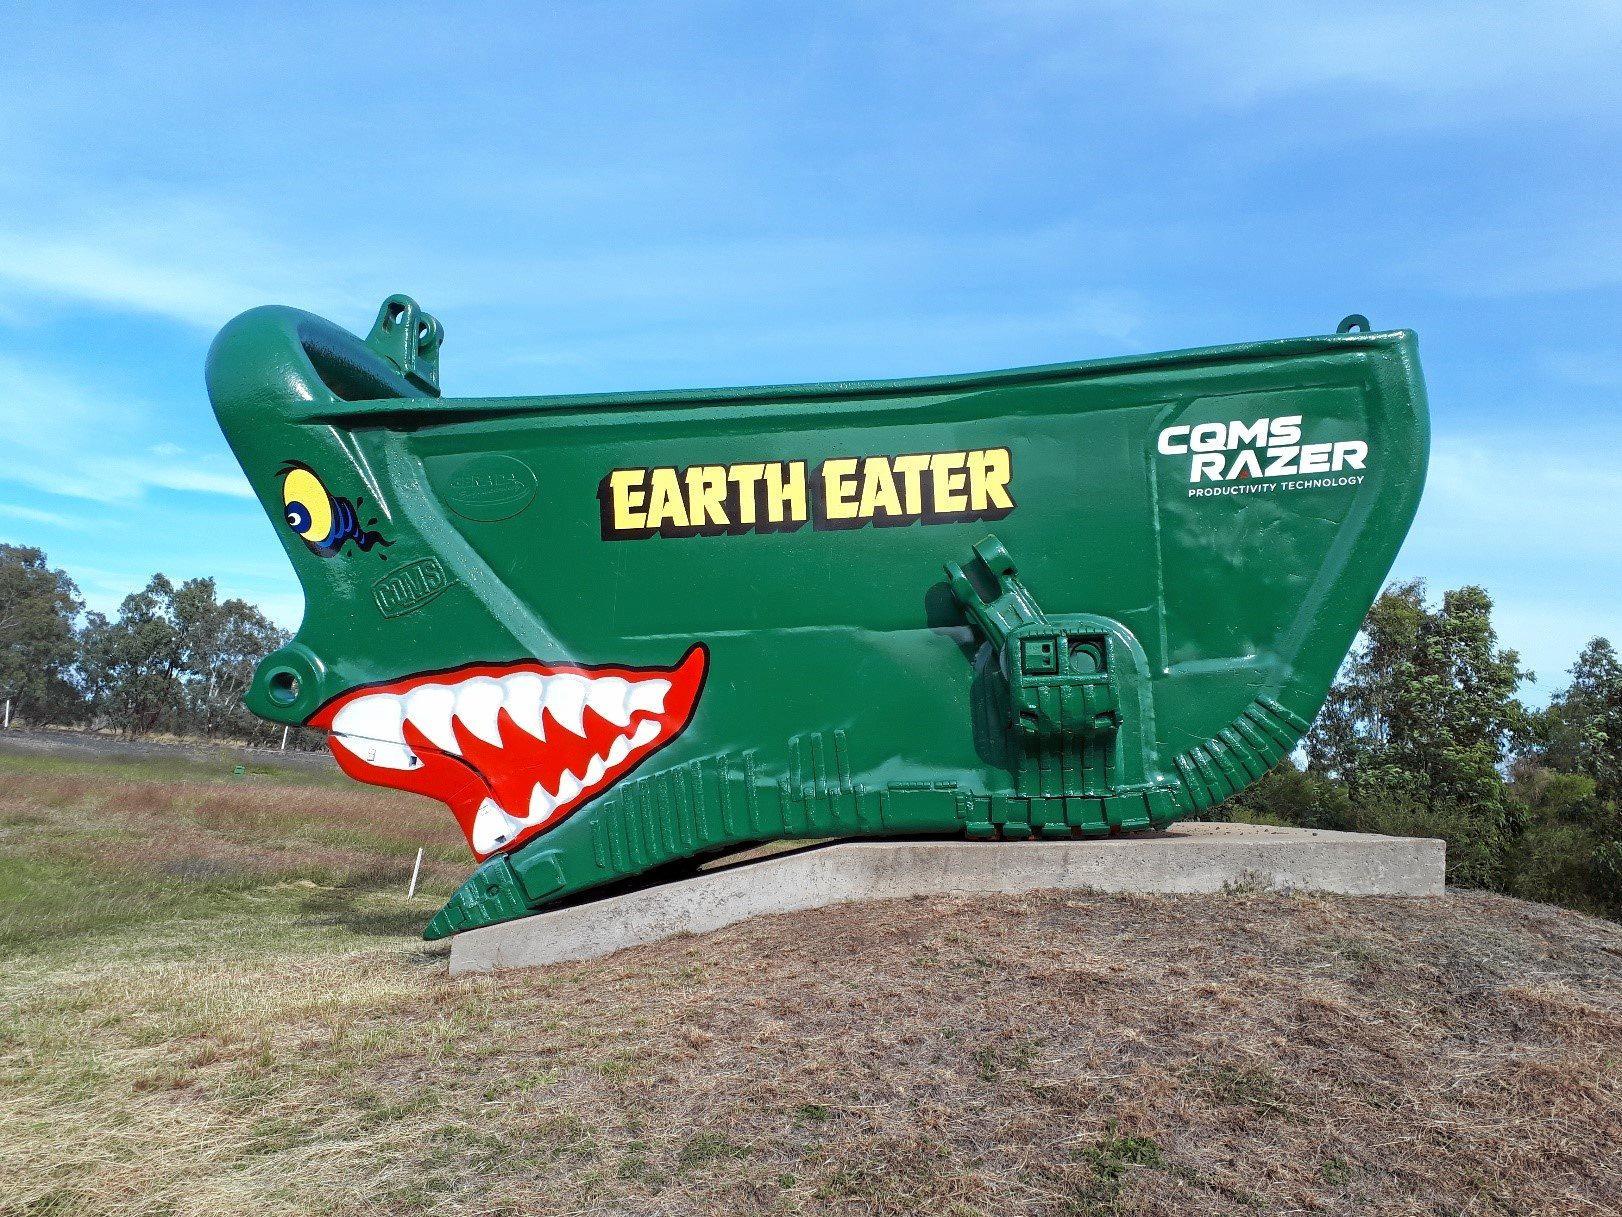 LANDMARK RESTORED: The refurbished EarthEater again shines as a landmark of mining history in Capella.